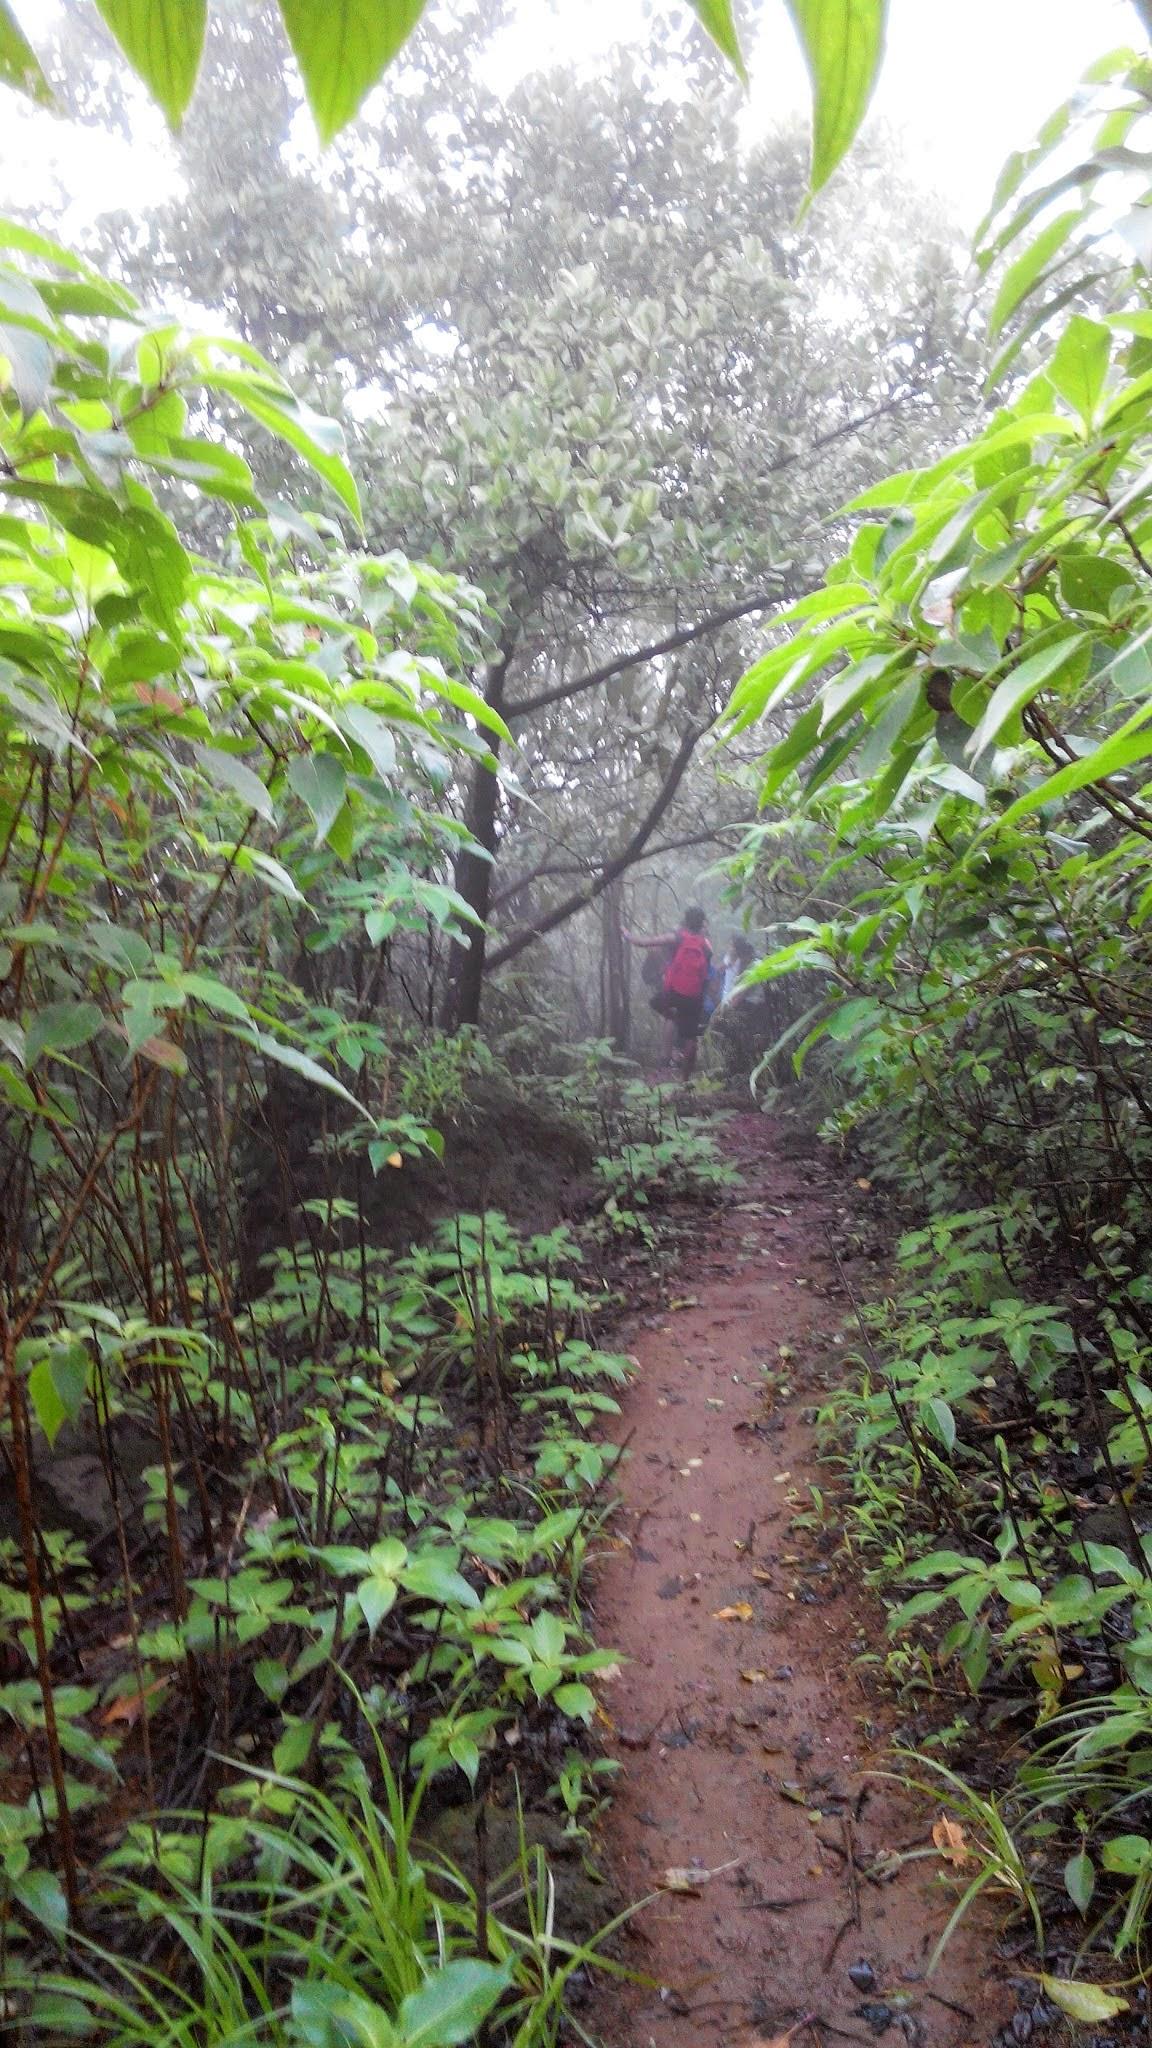 Road to Prabalgad